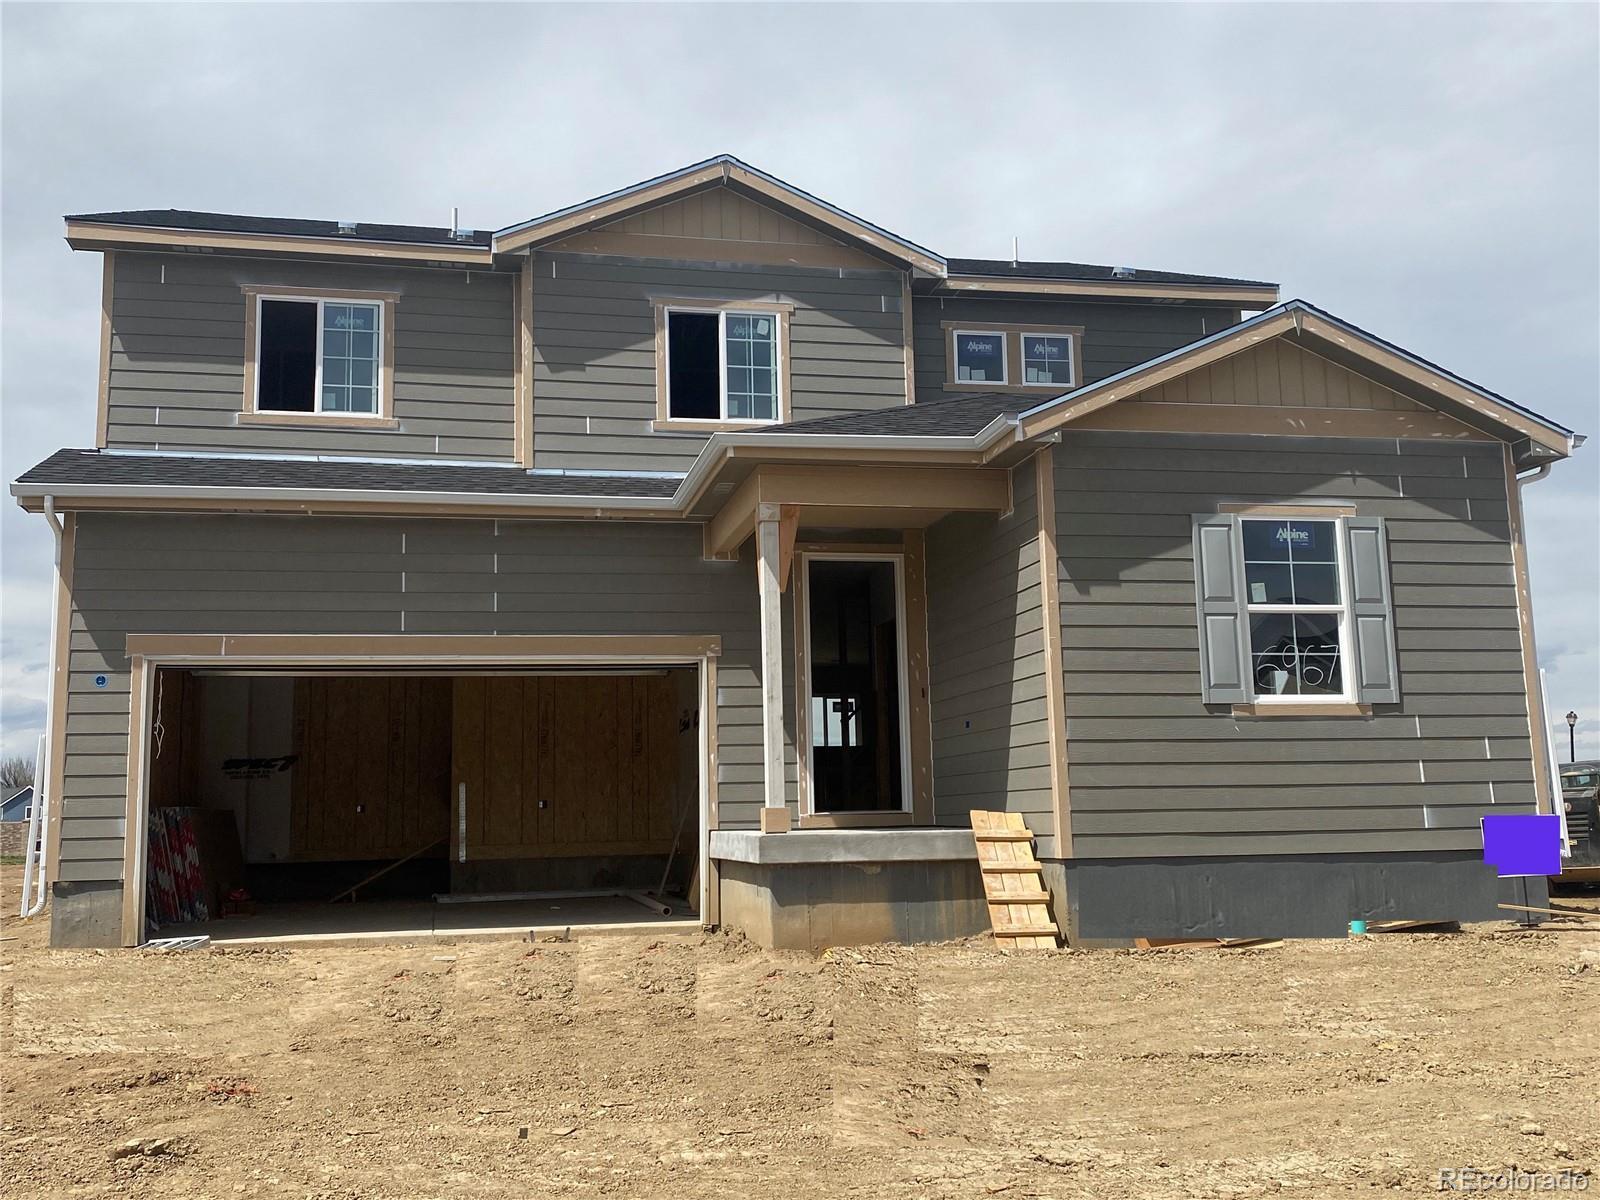 6967 E 119th Avenue Property Photo - Thornton, CO real estate listing